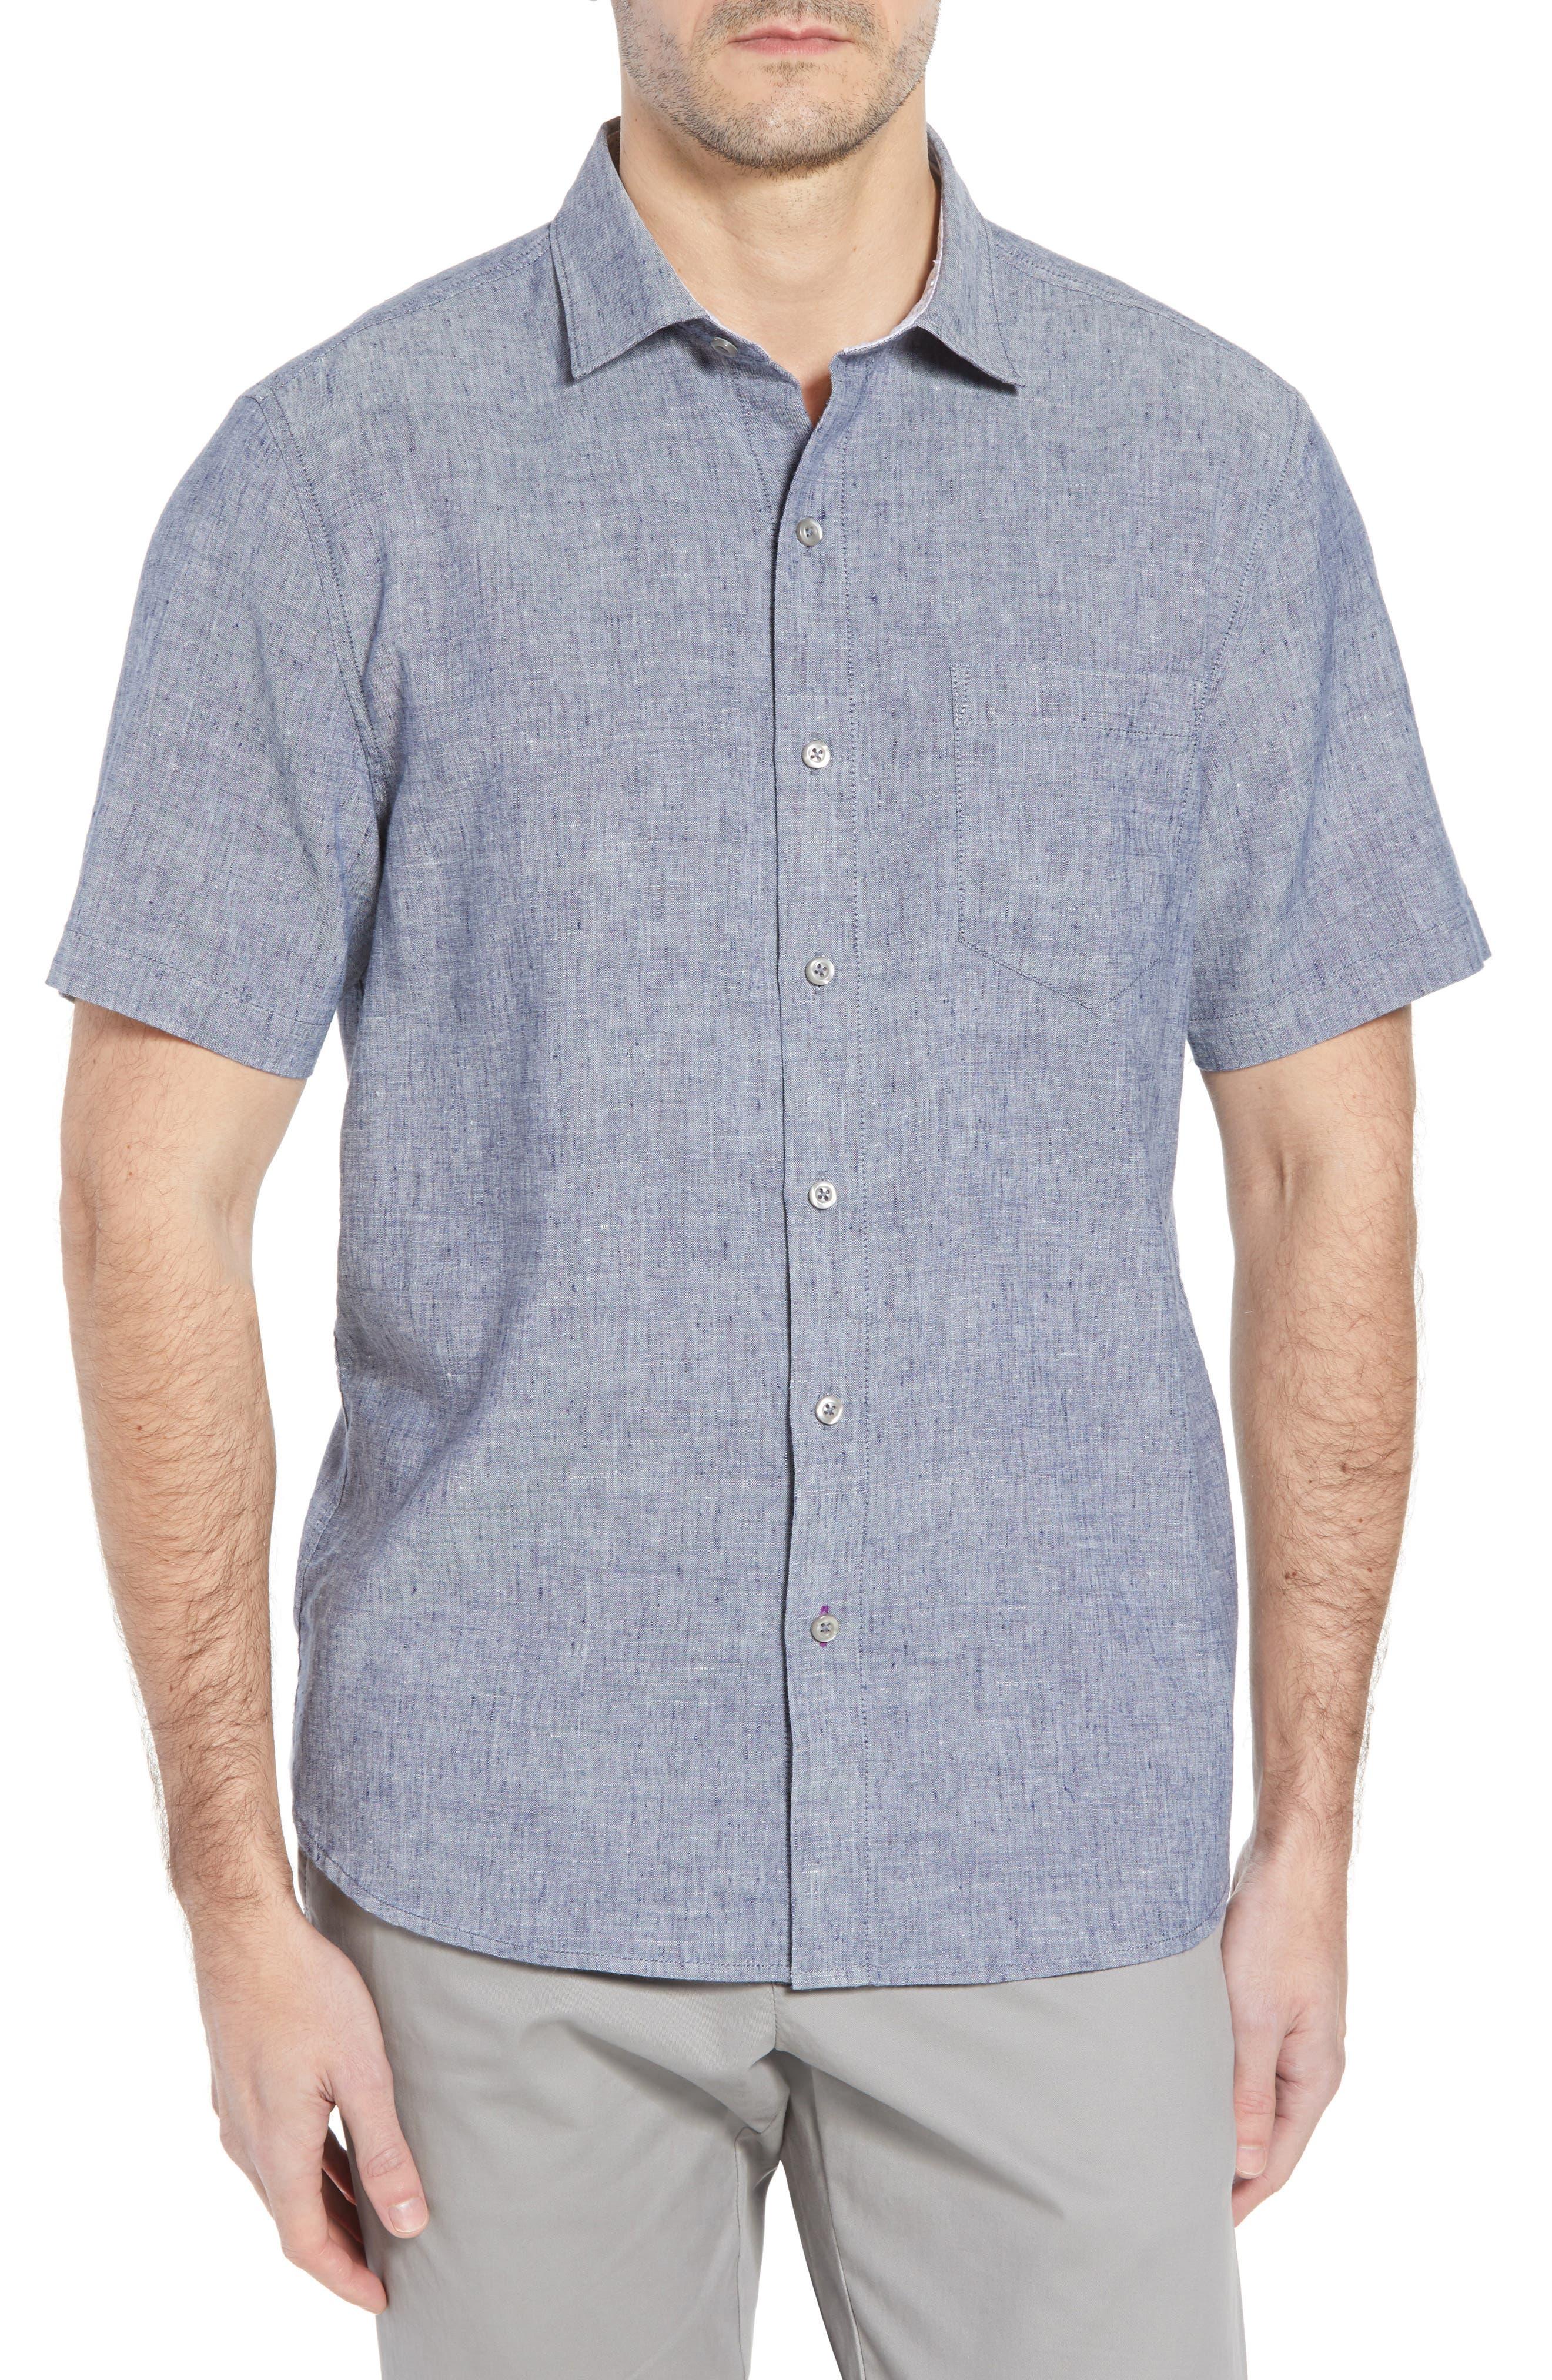 Lanai Tides Linen Blend Sport Shirt,                             Main thumbnail 1, color,                             THRONE BLUE